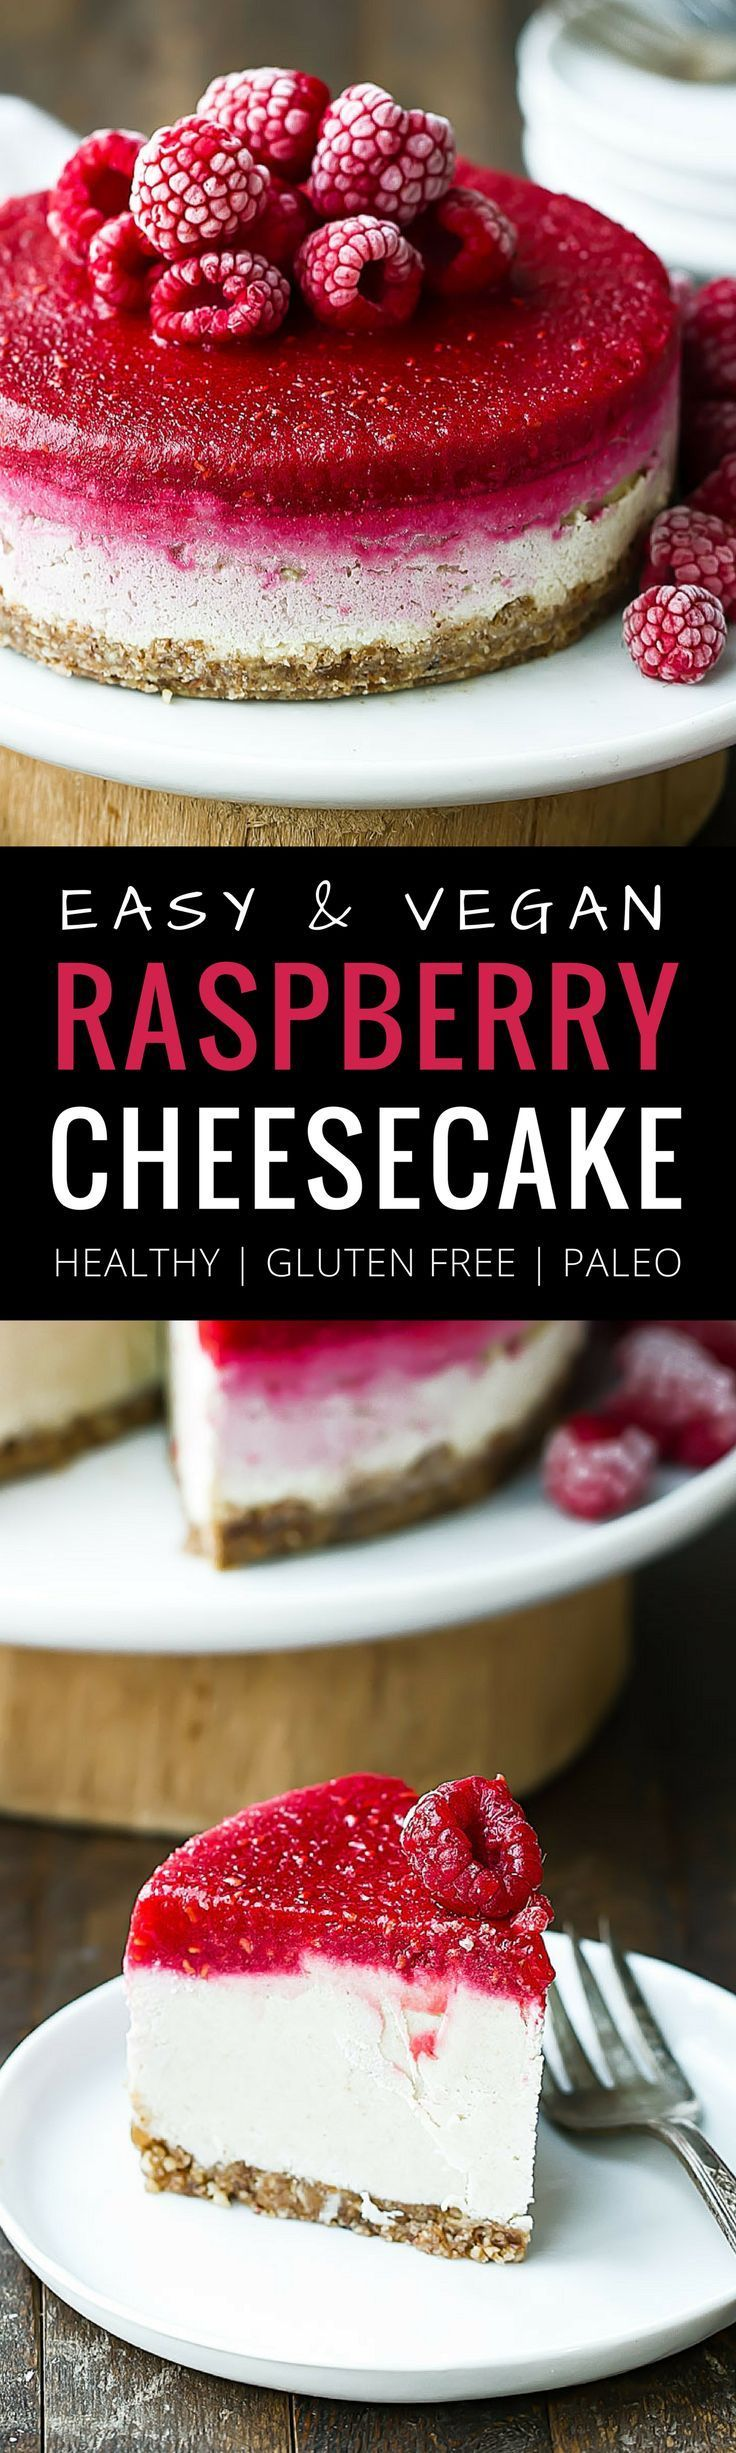 Easy Vegan Raspberry Cheesecake.